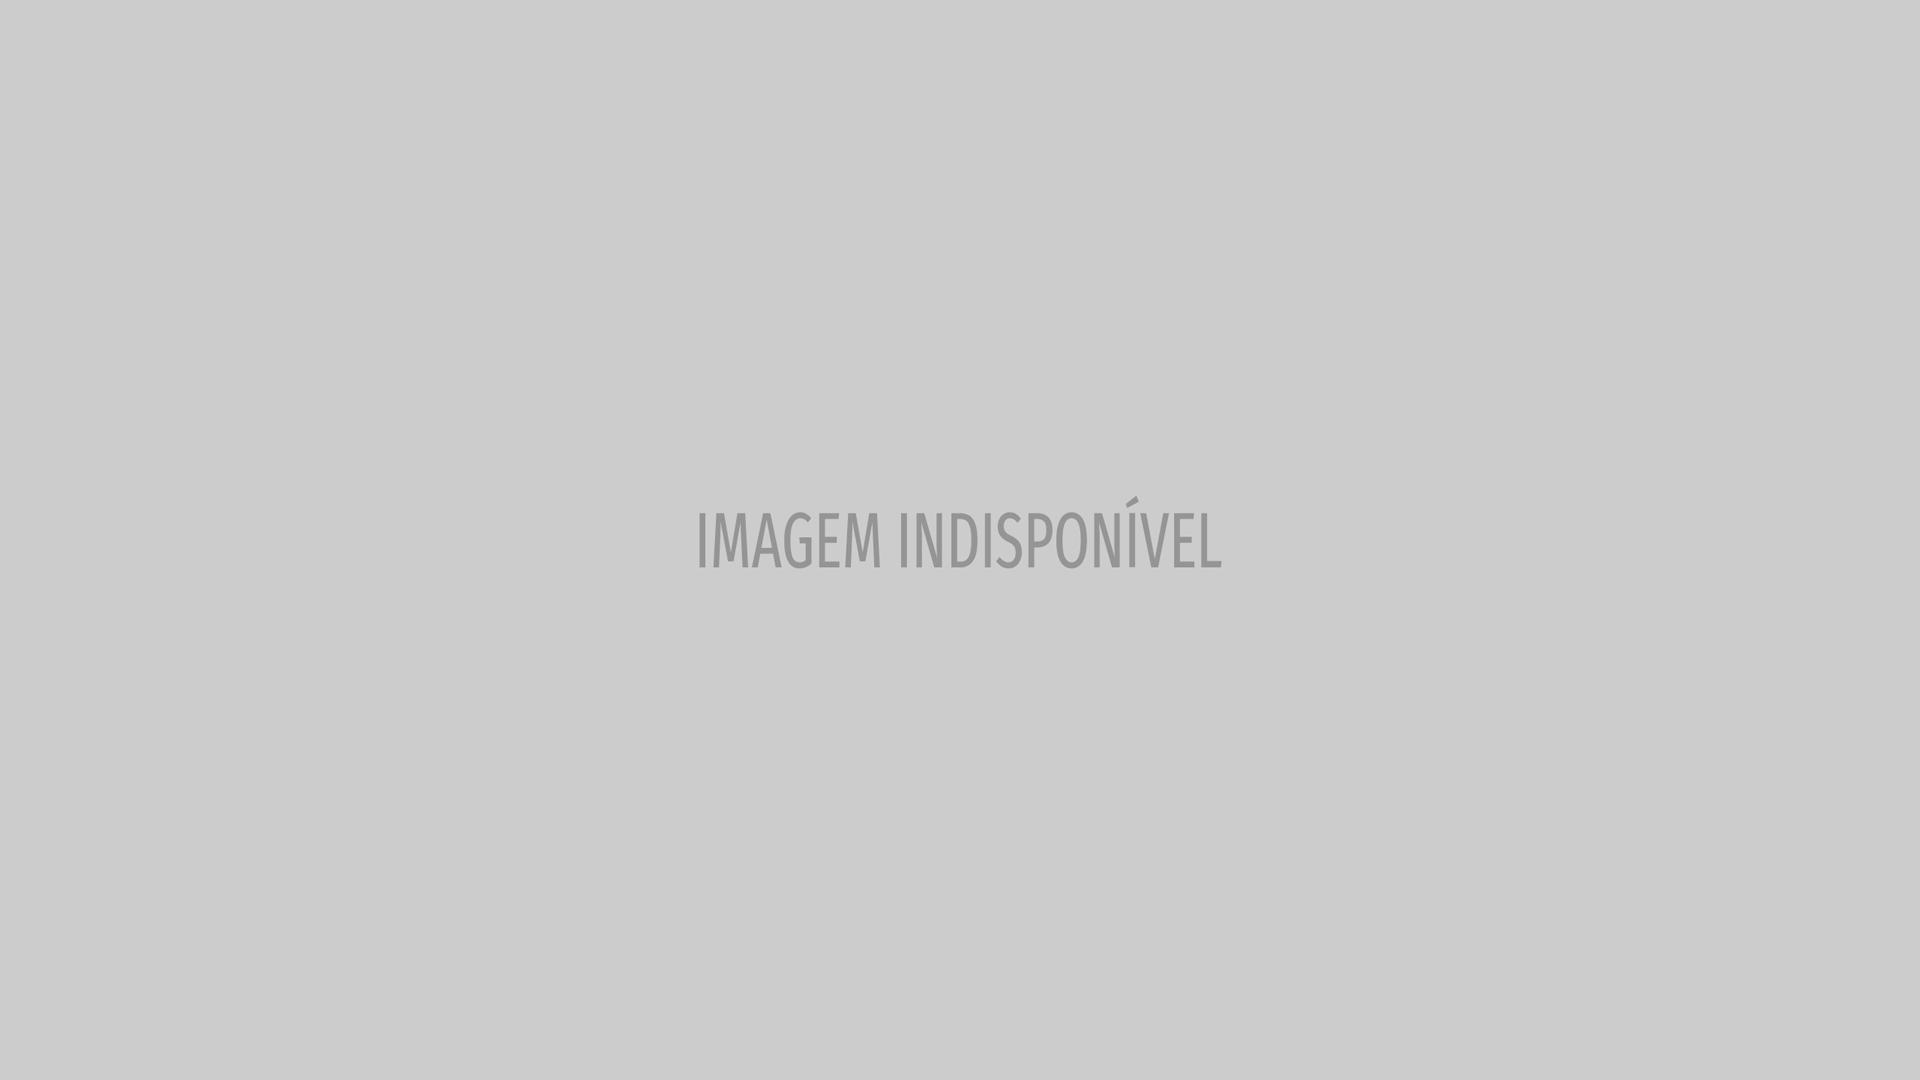 Irmã de Neymar, Rafaella revela que já fez botox na testa